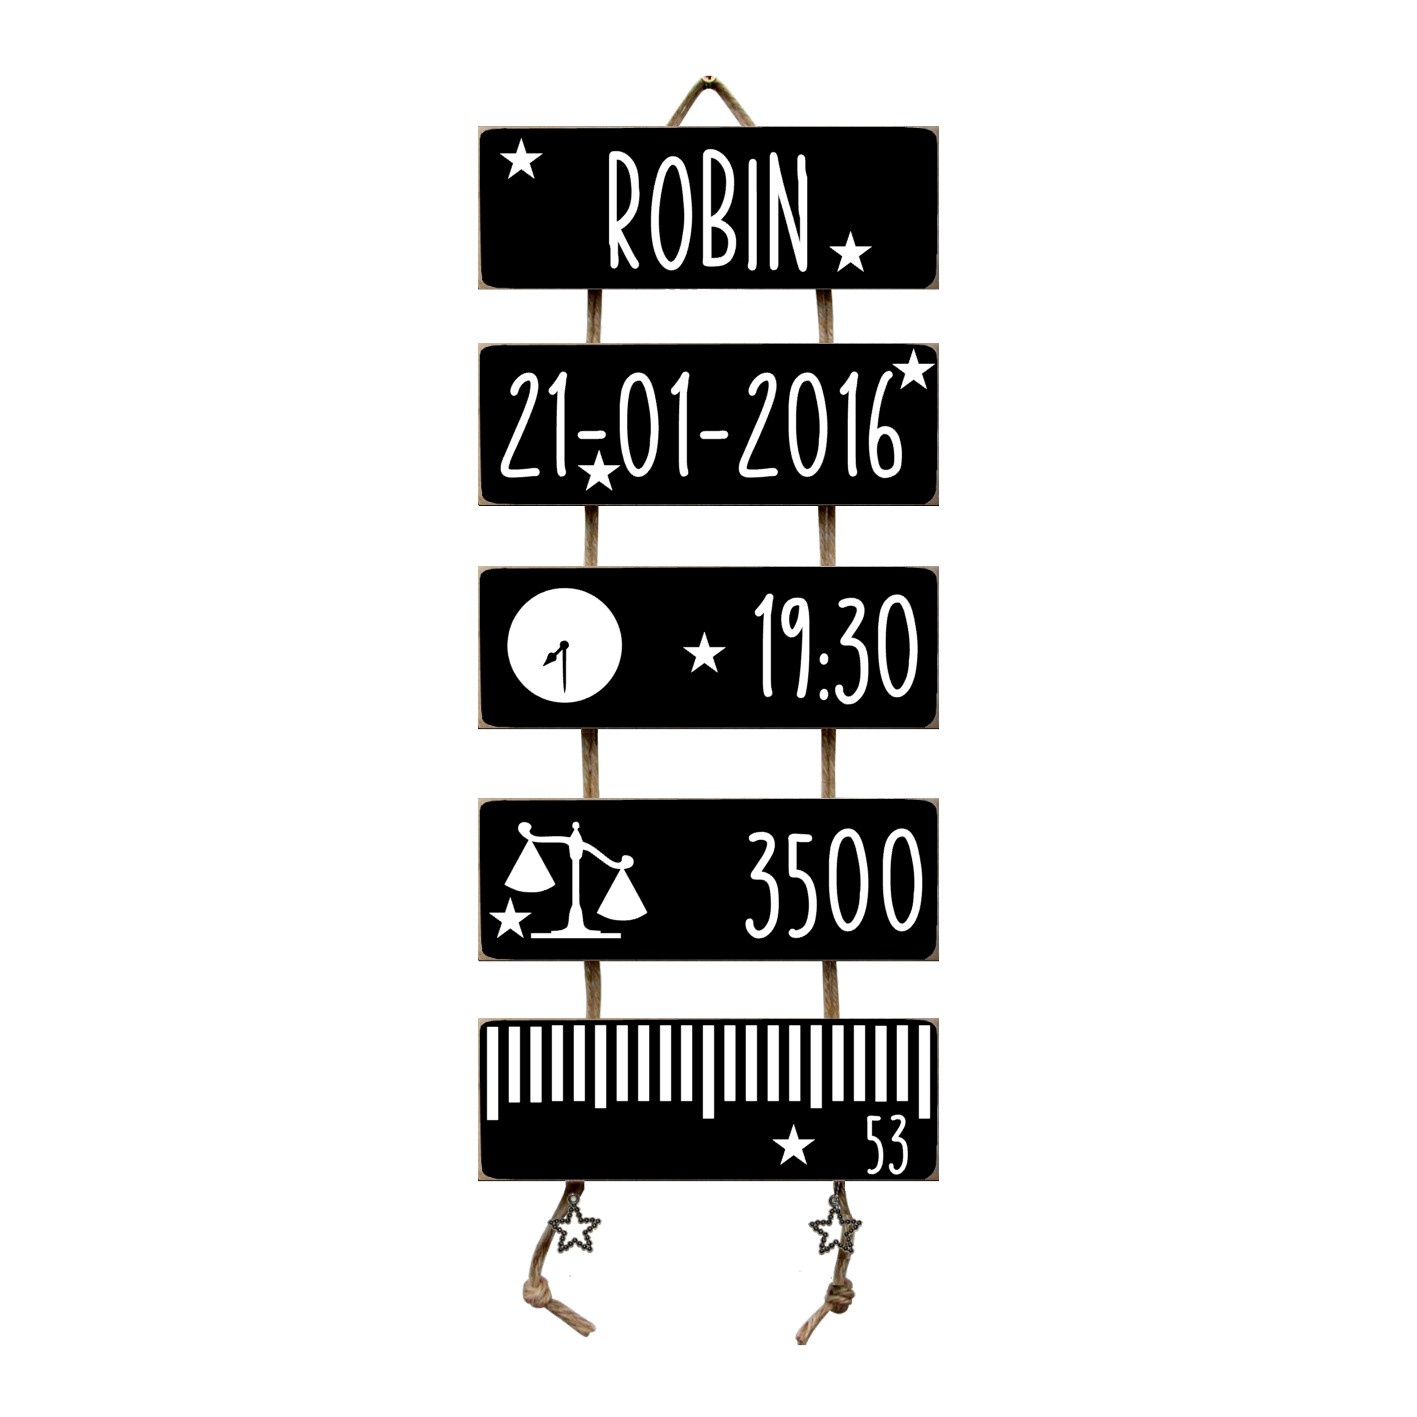 Kraamcadeau Geboorteladder Robin Zwart